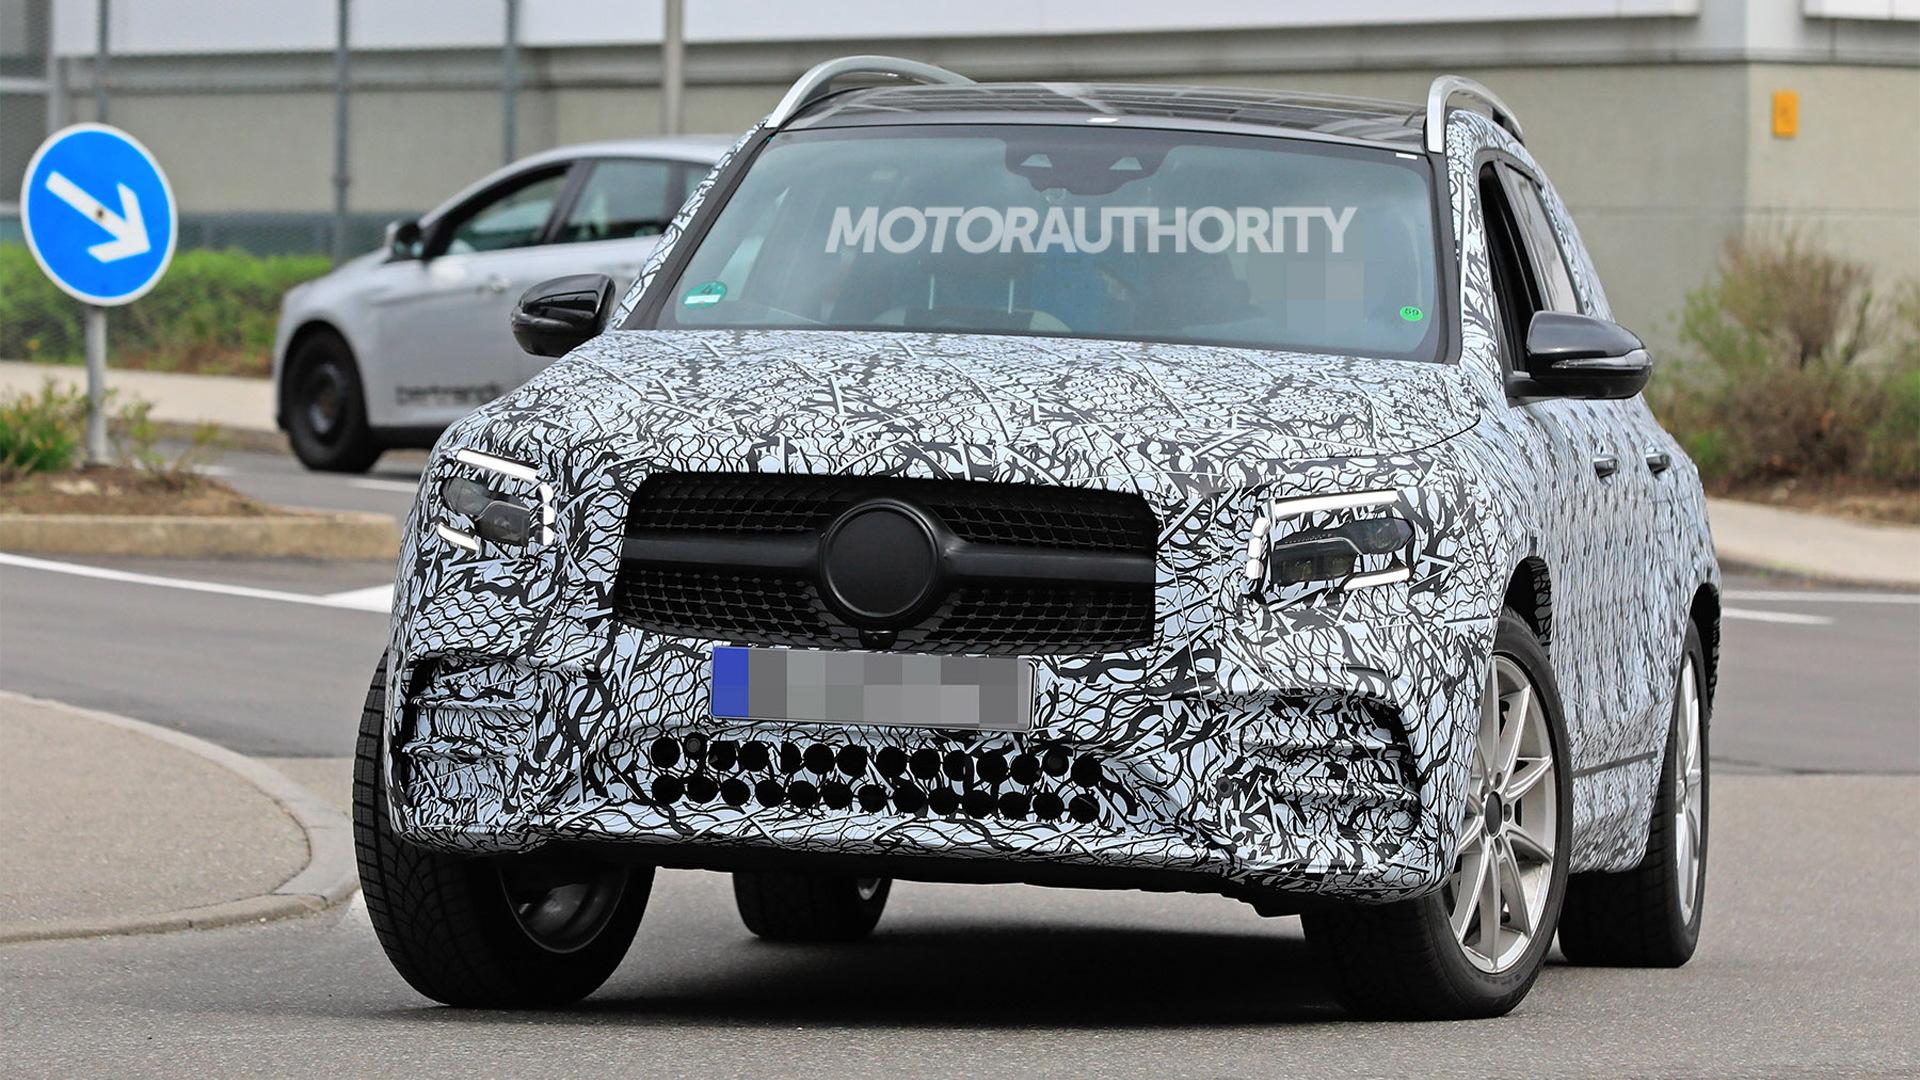 2020 Mercedes-Benz GLB spy shots - Image via S. Baldauf/SB-Medien